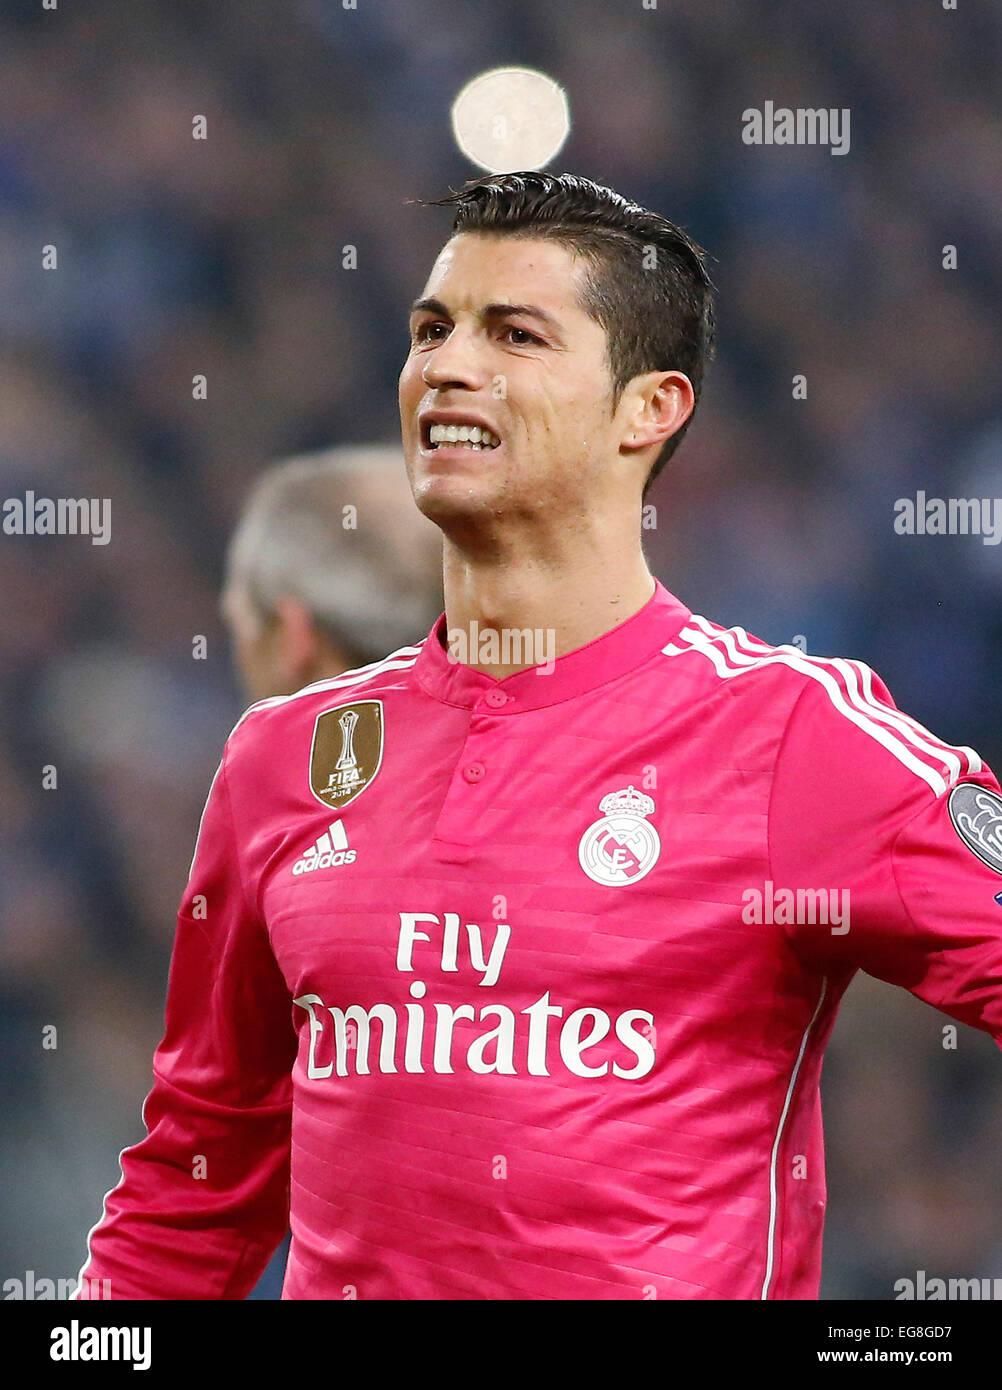 finest selection e539d 3c047 pink ronaldo jersey